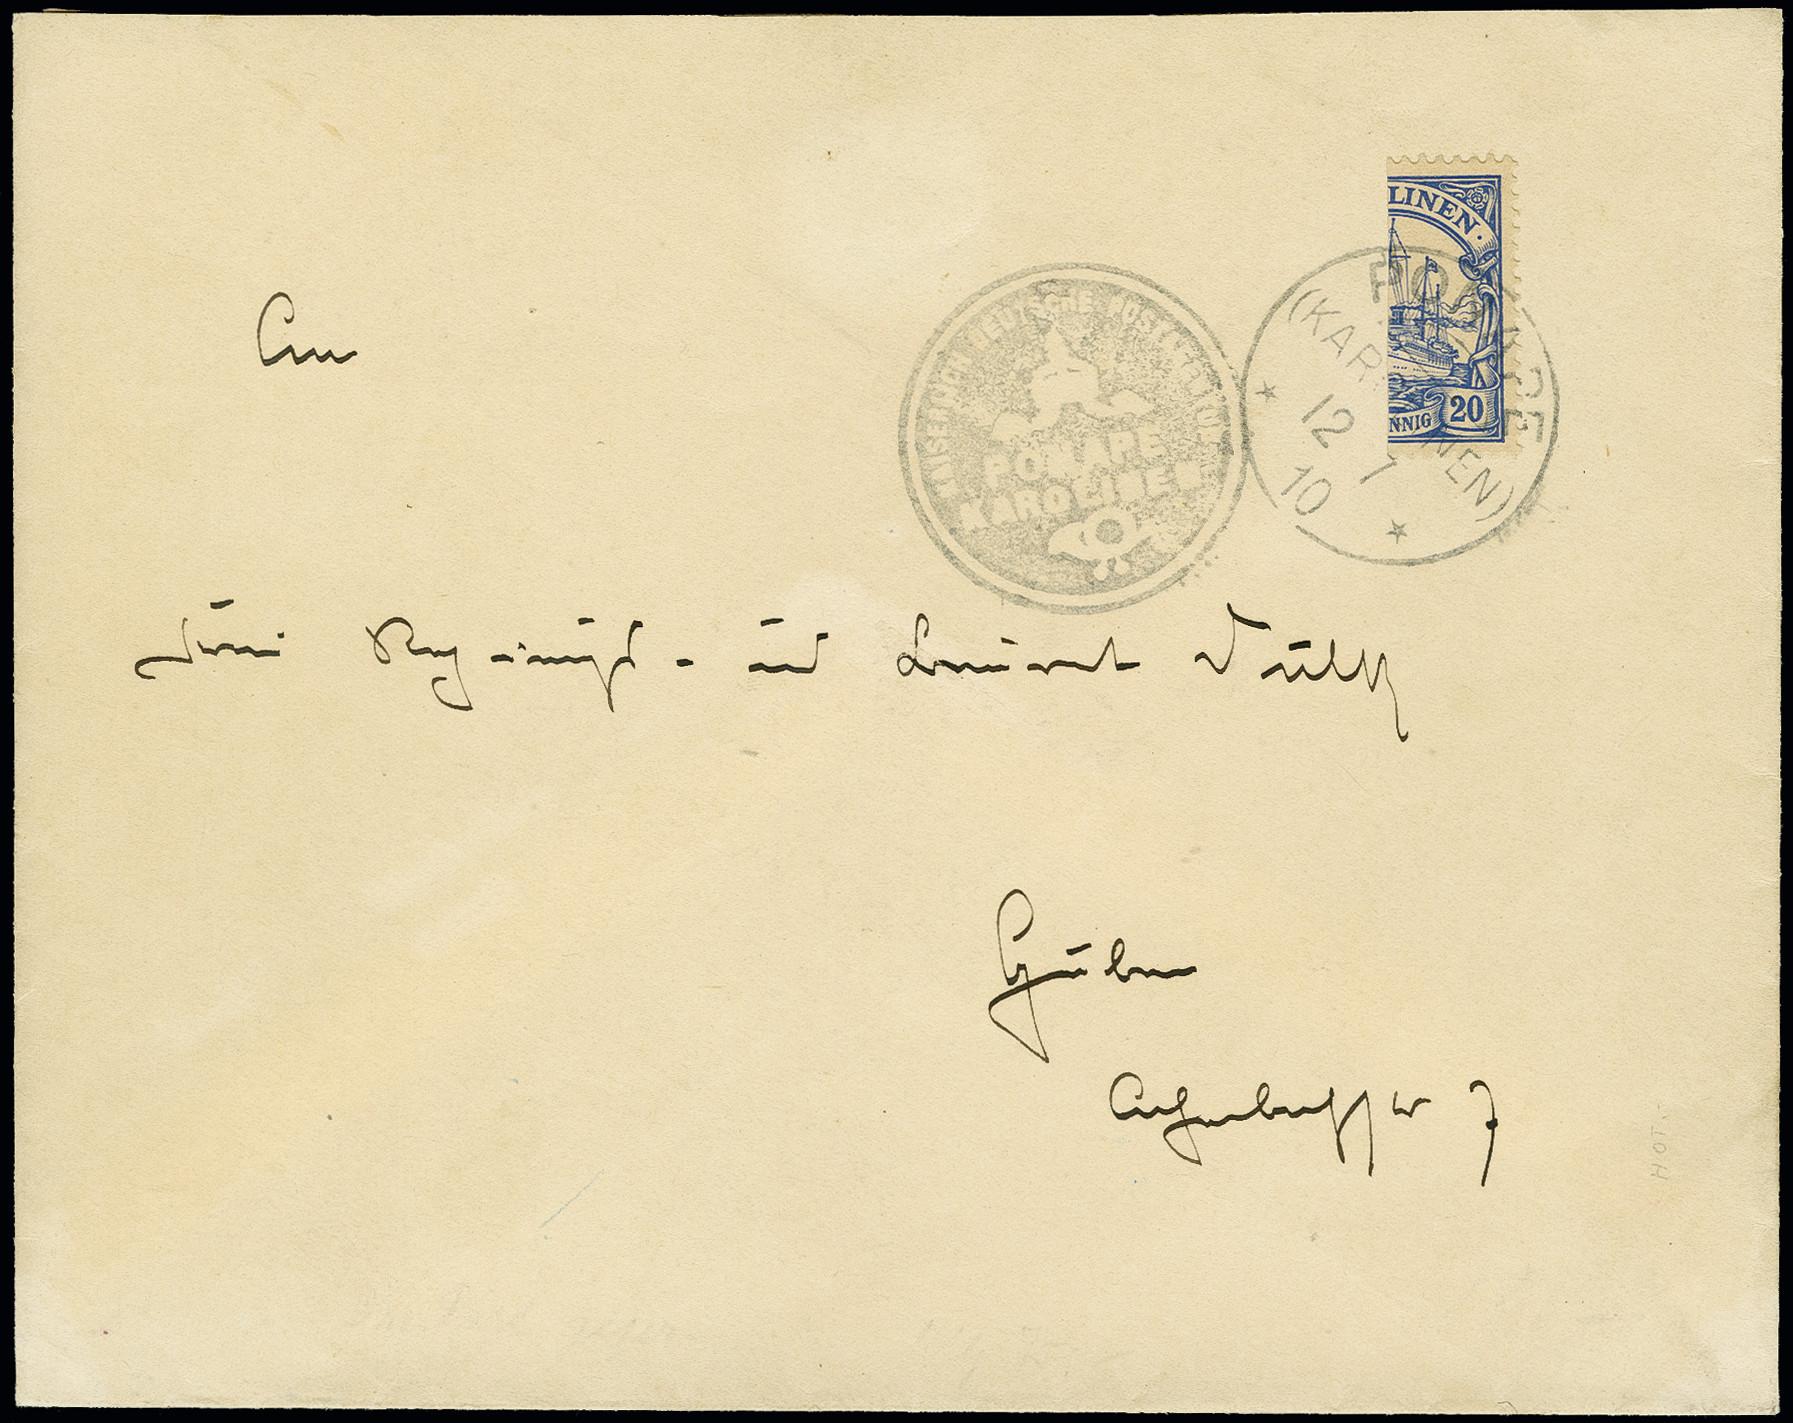 Lot 1456 - german colonies and offices abroad caroline islands -  Heinrich Koehler Auktionen Auction #367- Day 3